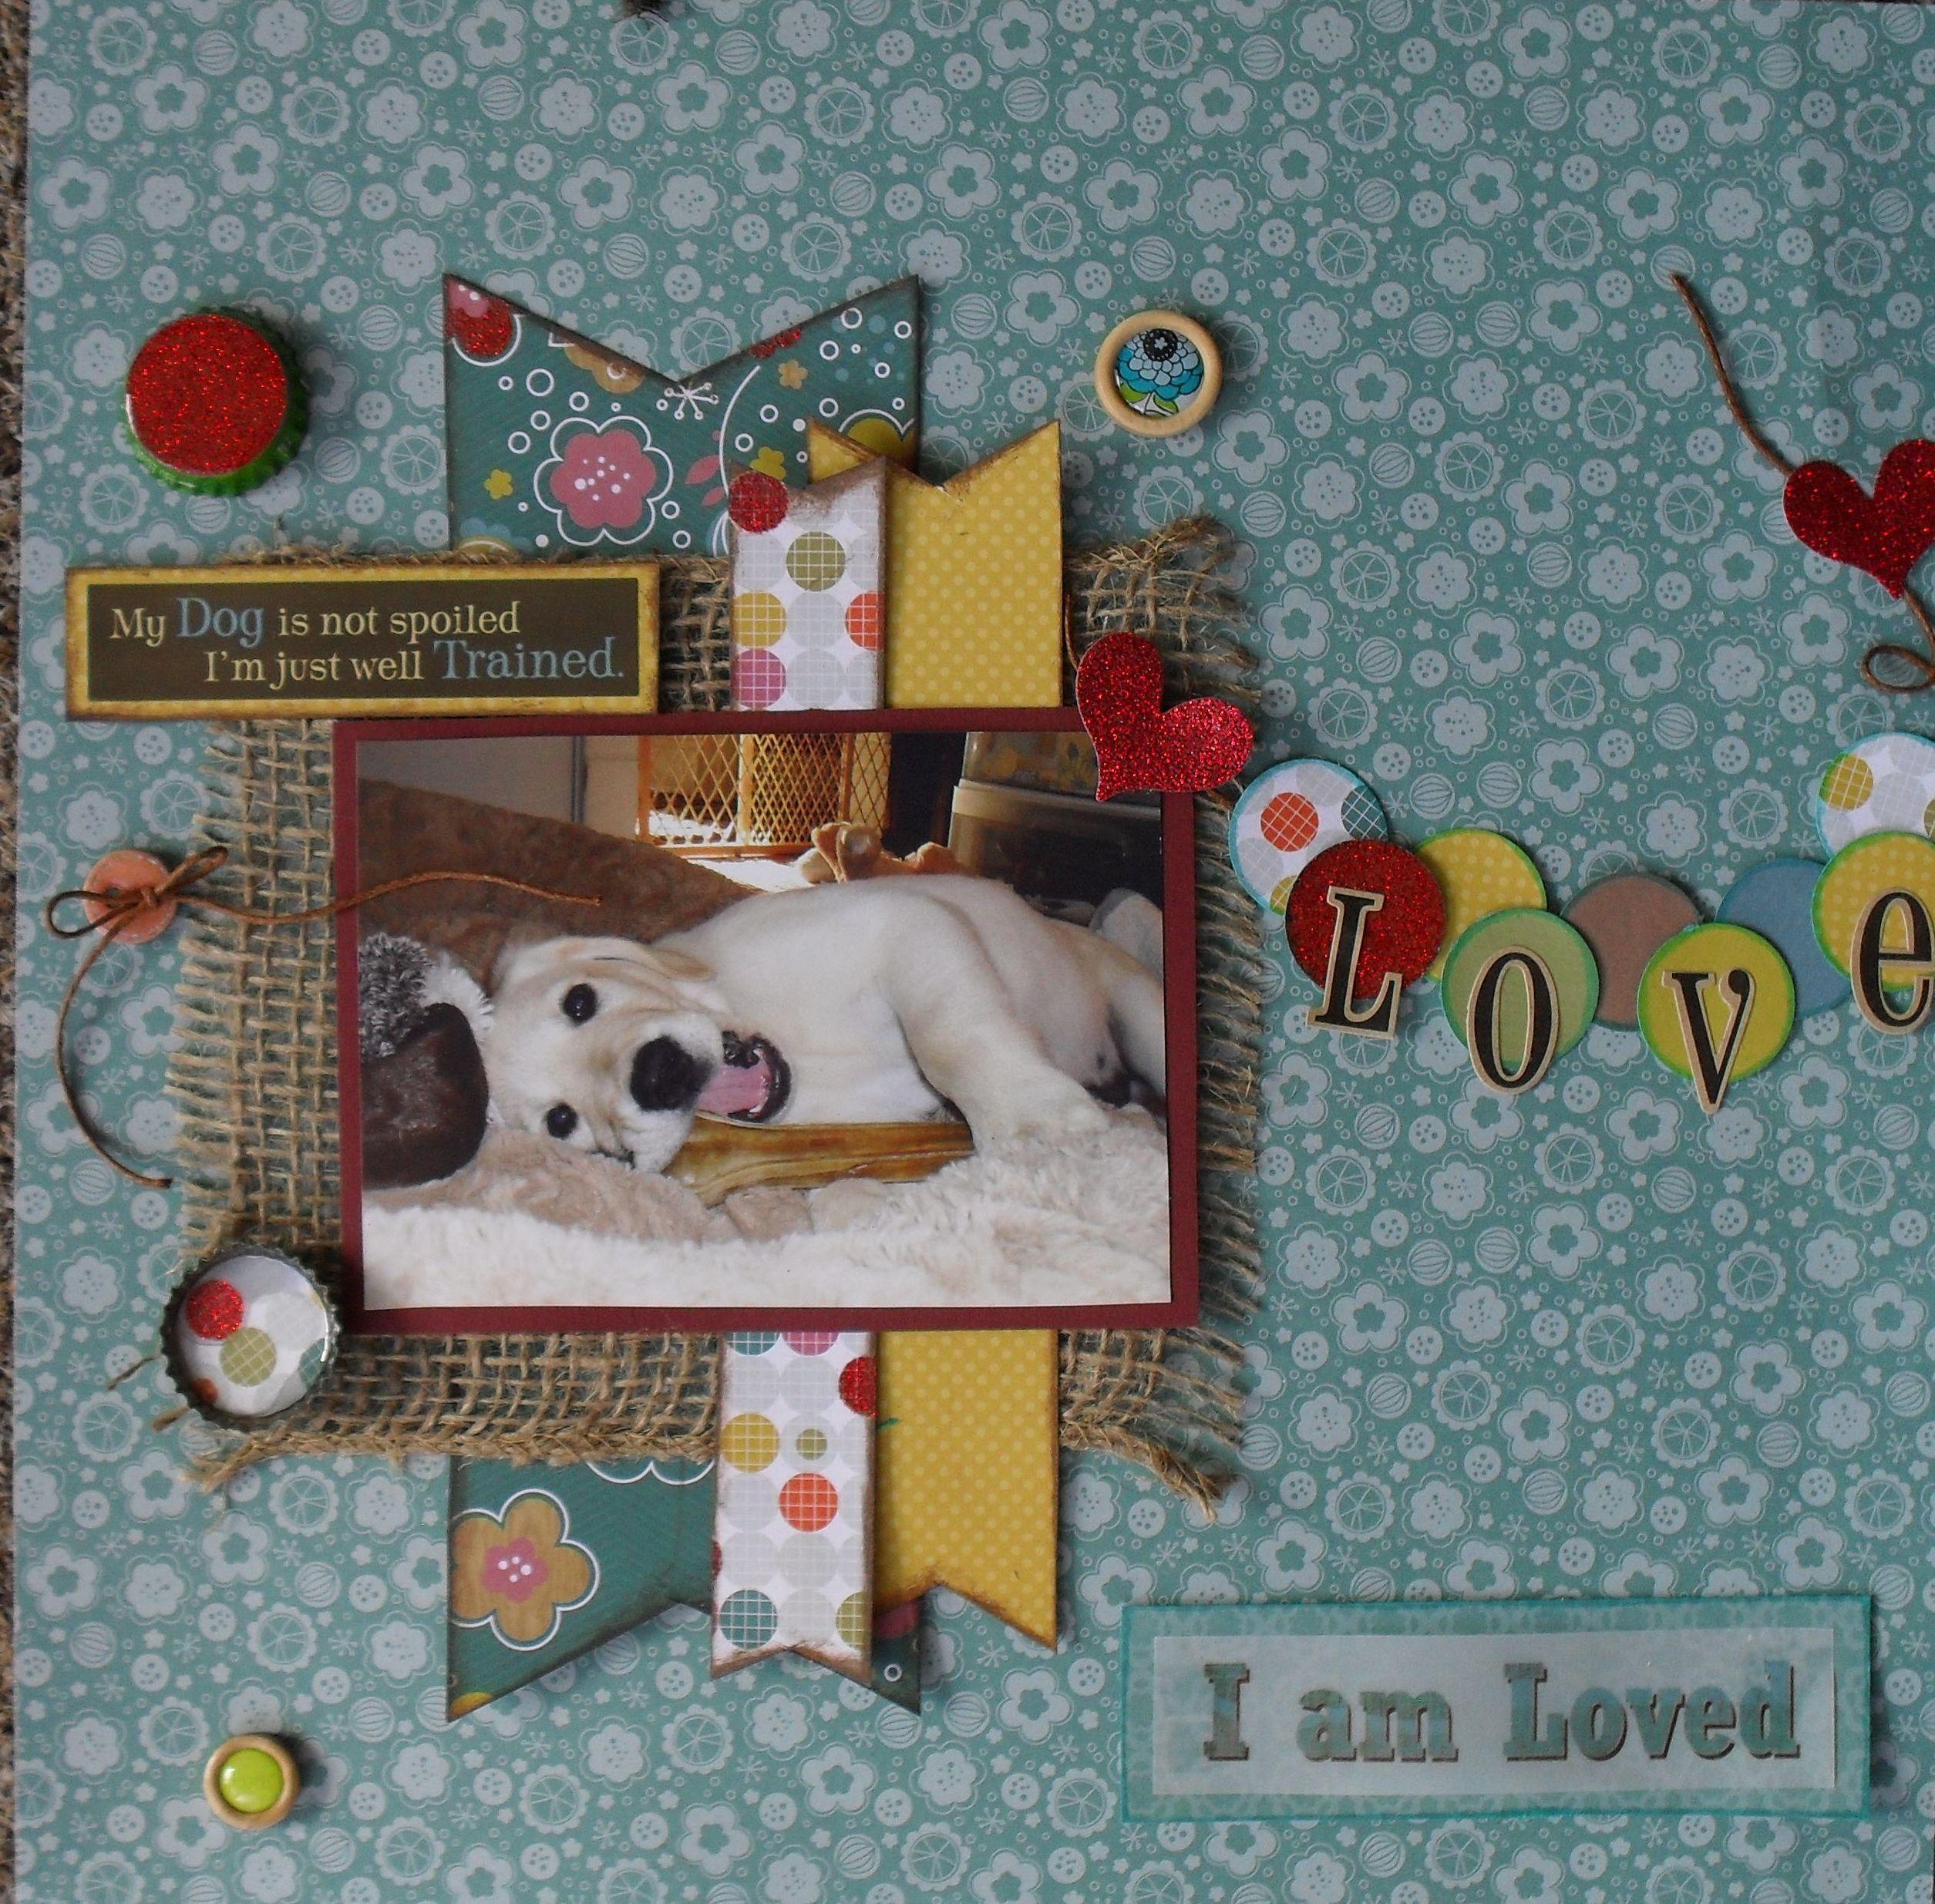 Scrapbook ideas for dogs -  I Am Loved Scrapbook Com